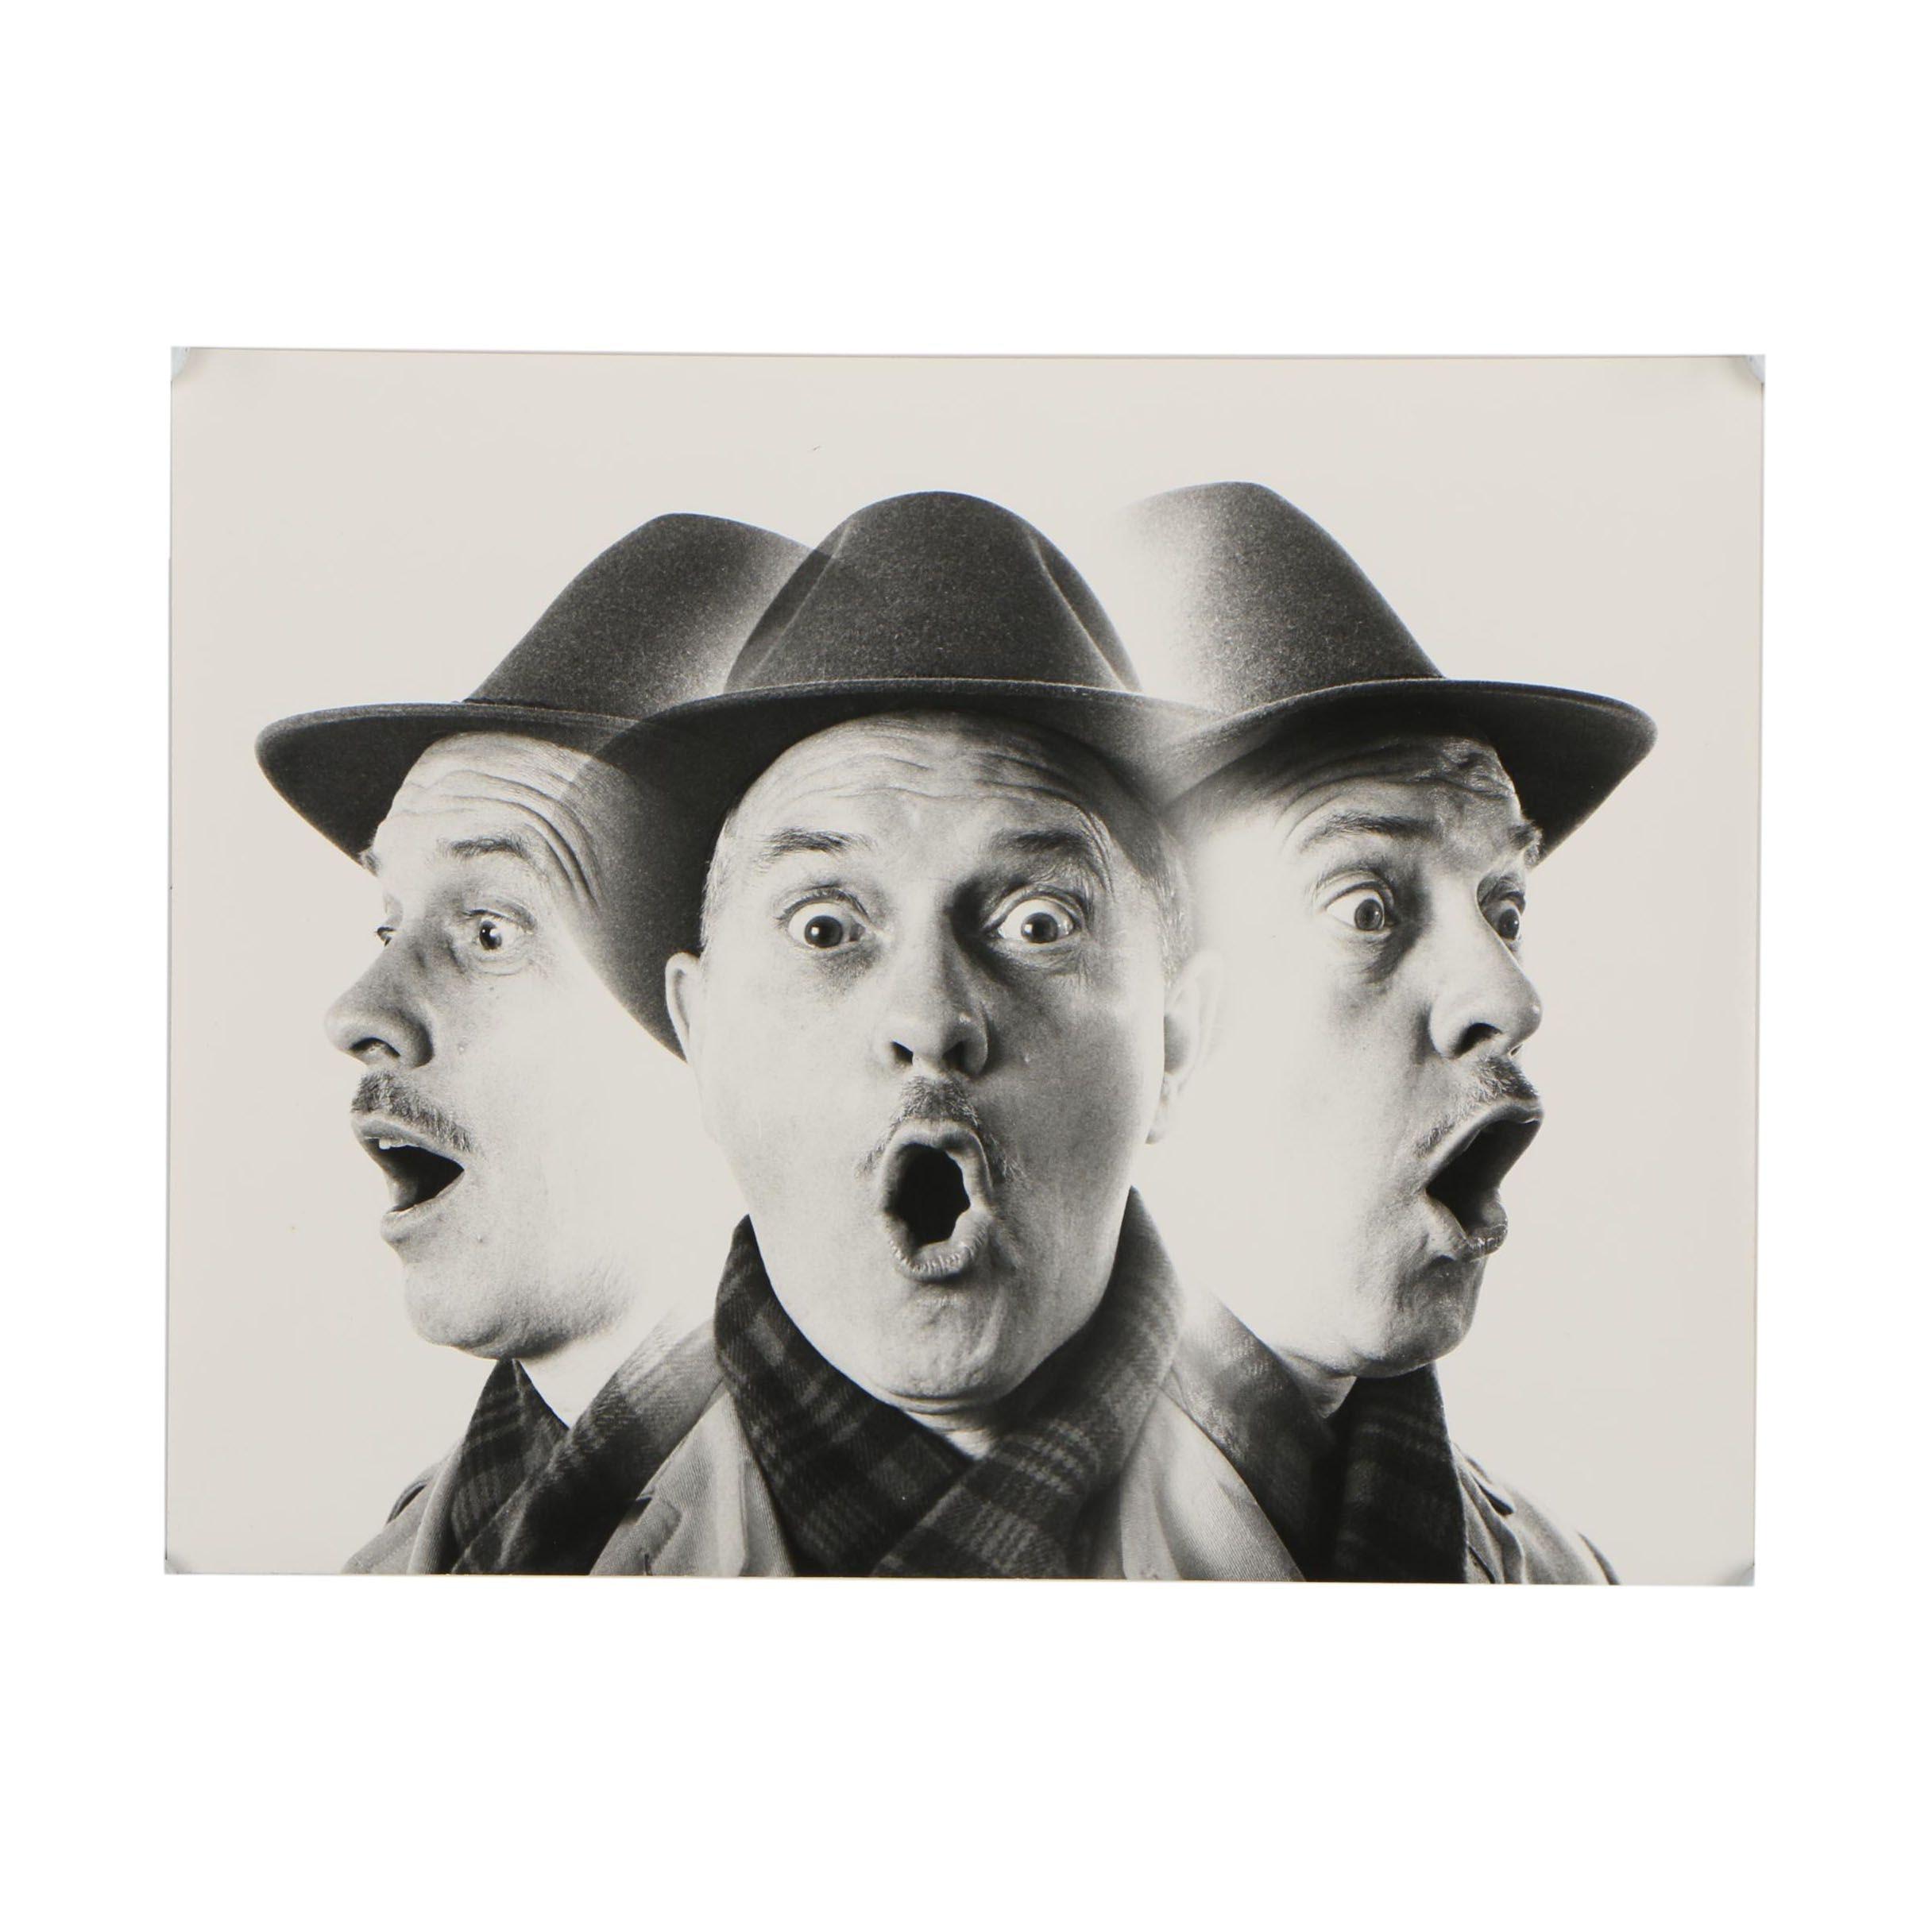 1958 Portrait Silver Gelatin Photograph